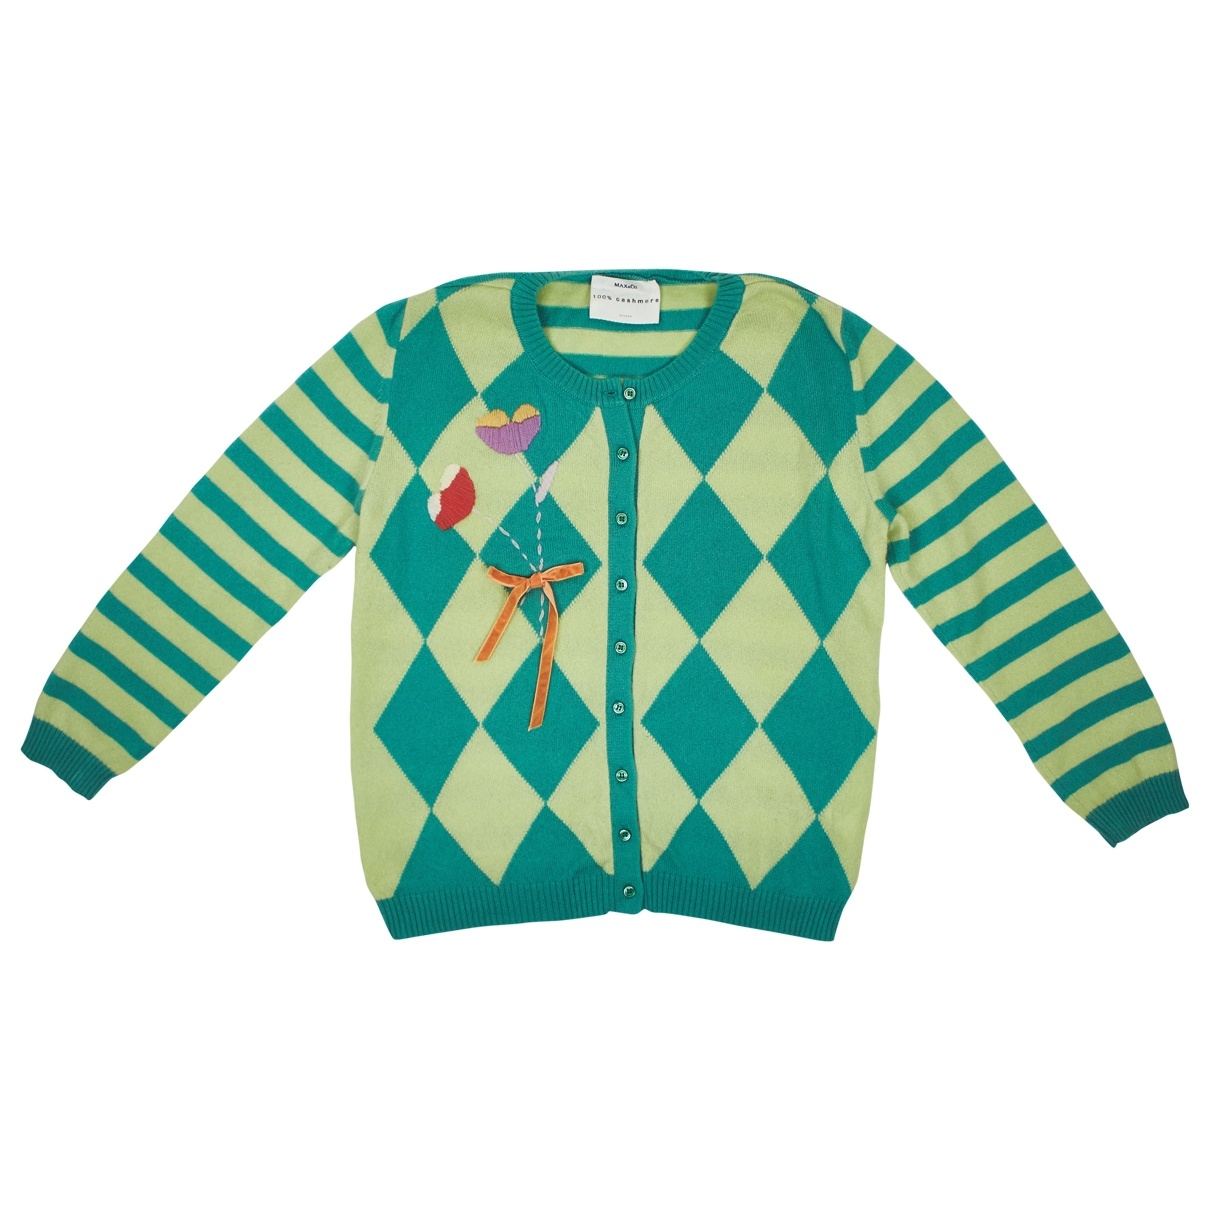 Max & Co \N Green Cashmere Knitwear for Women M International